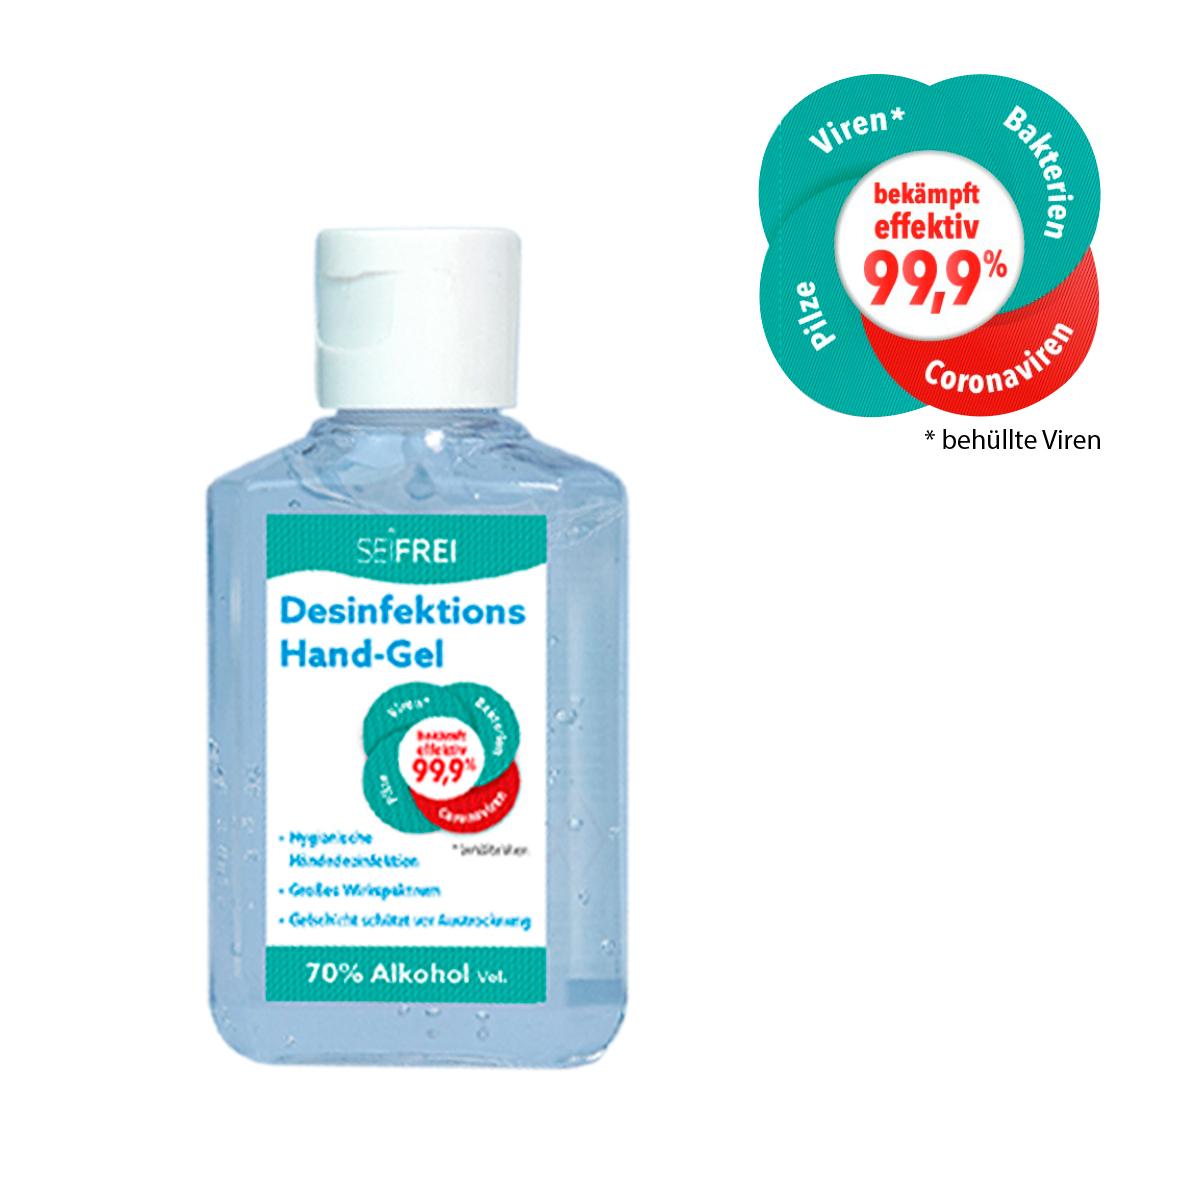 Desinfektions Hand-Gel 60ml